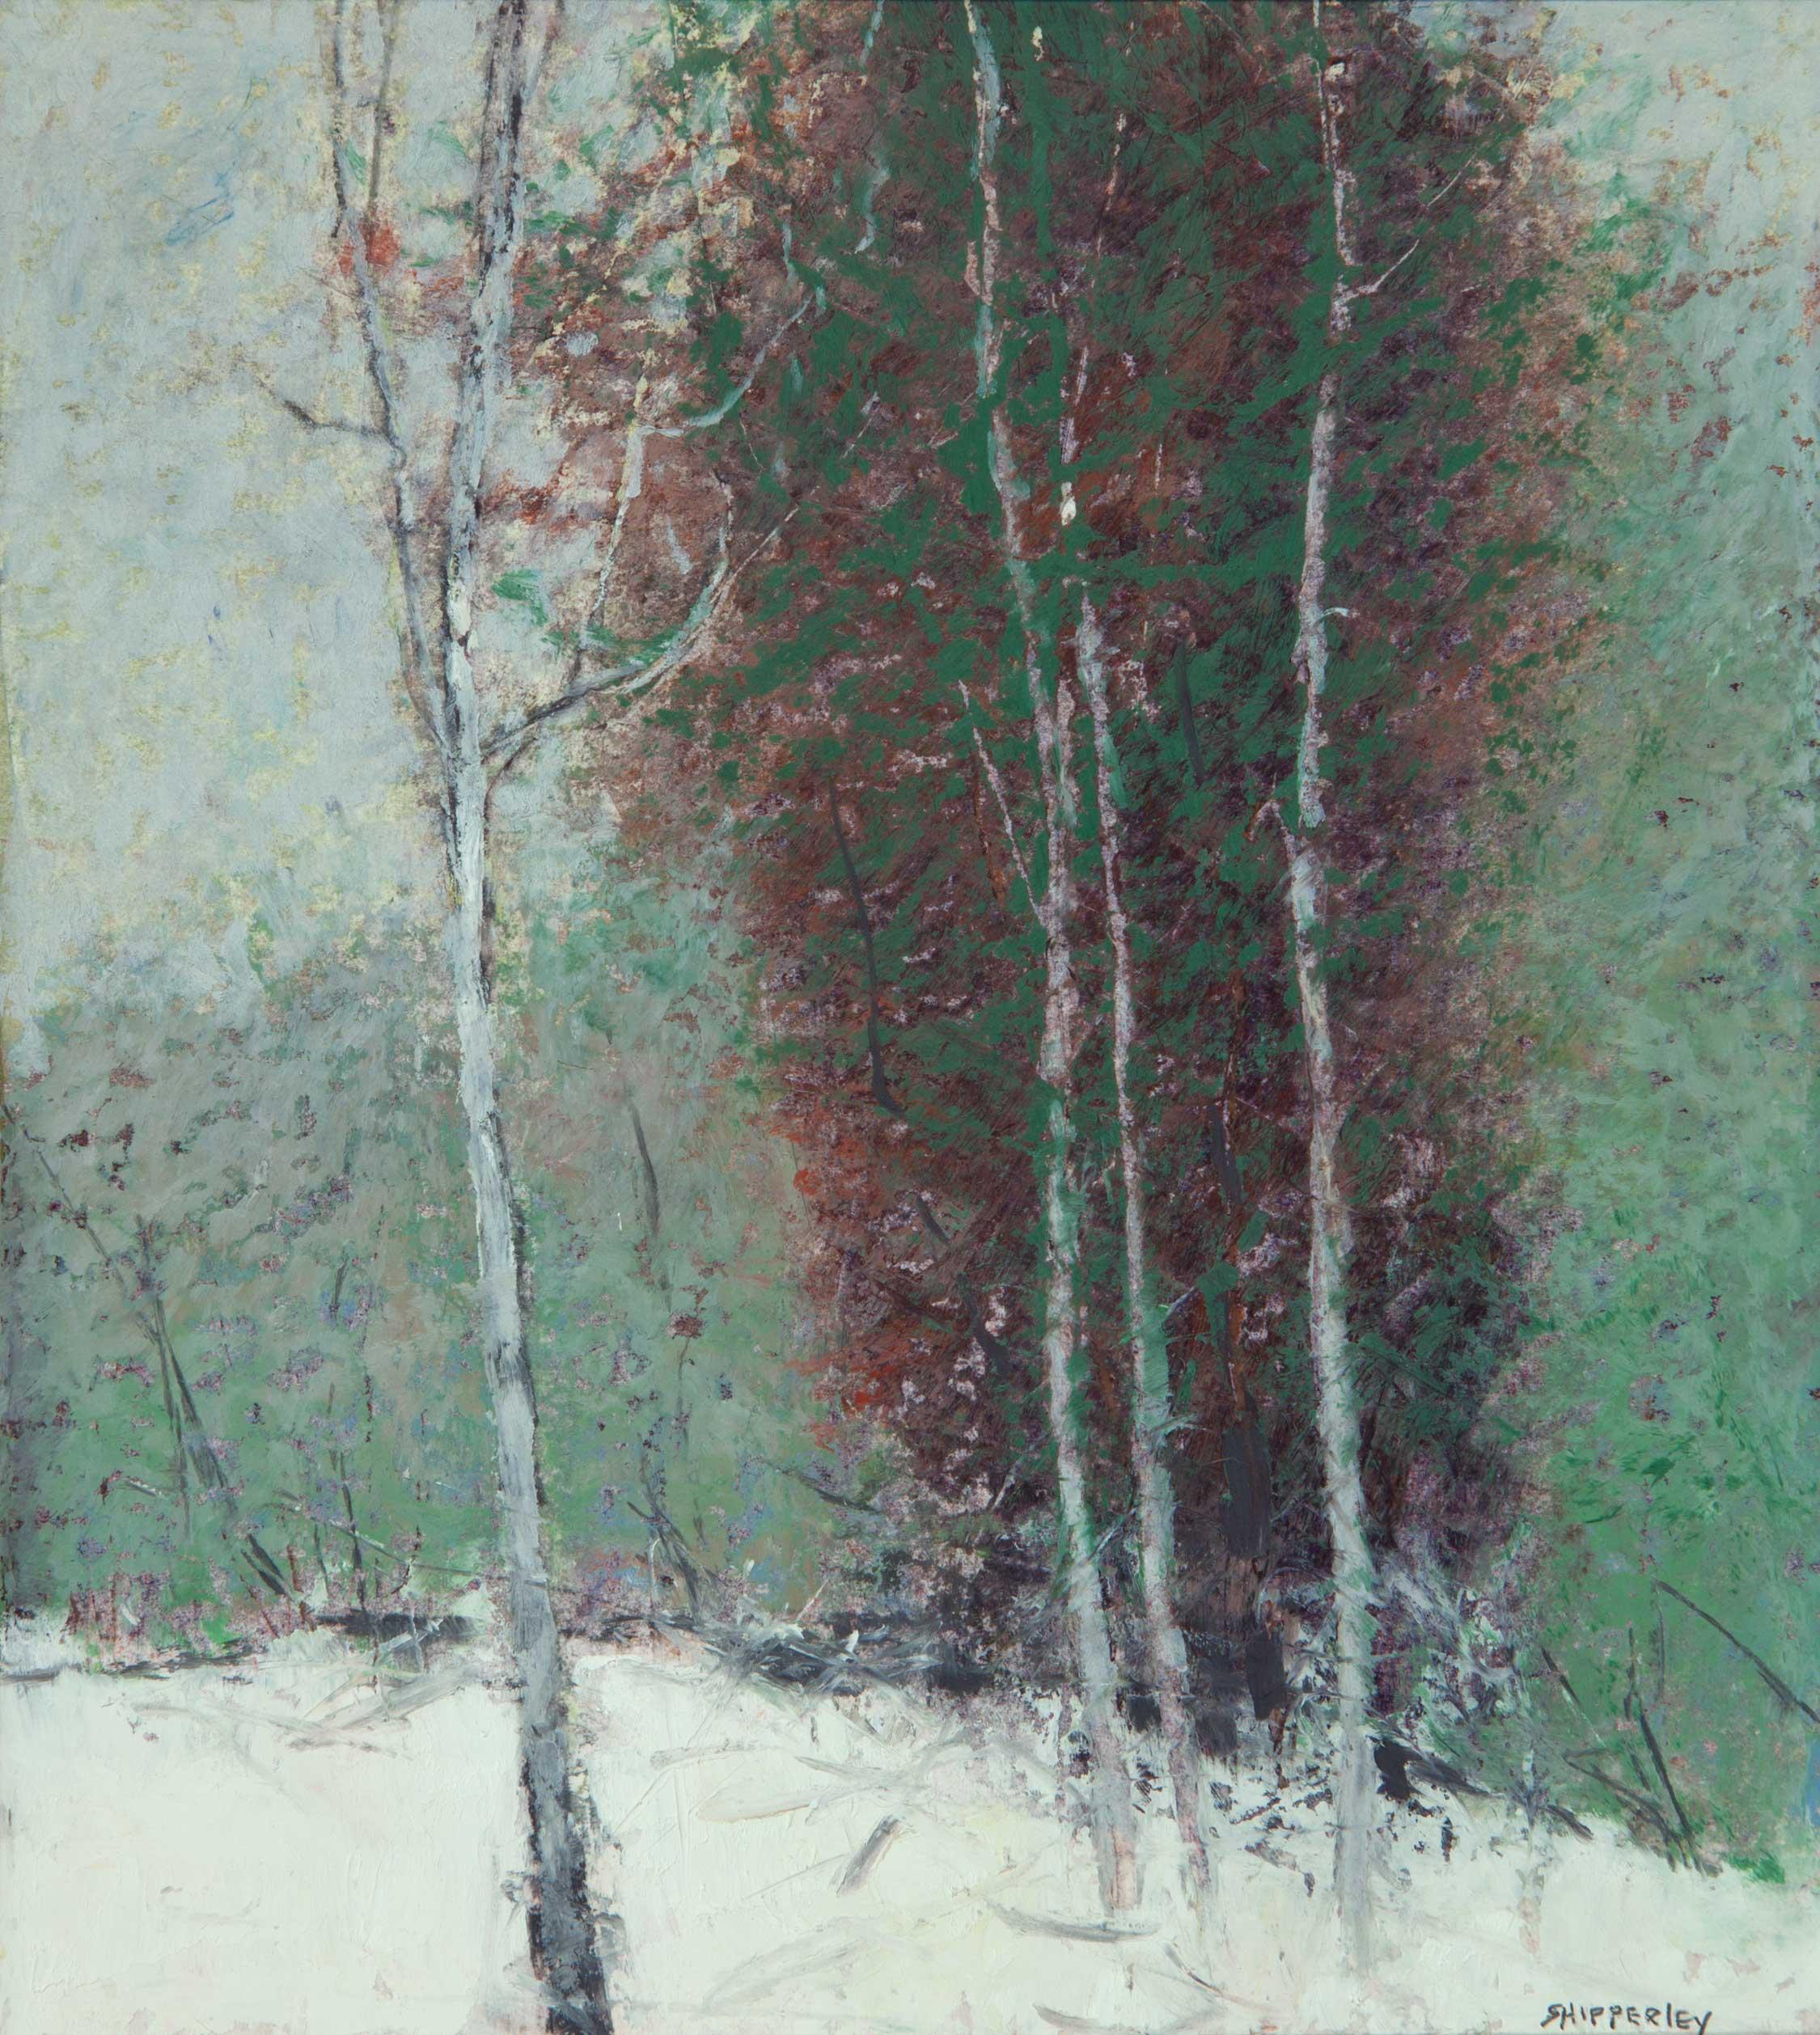 Winter Grays 16 x 15 (9 x 8) $850